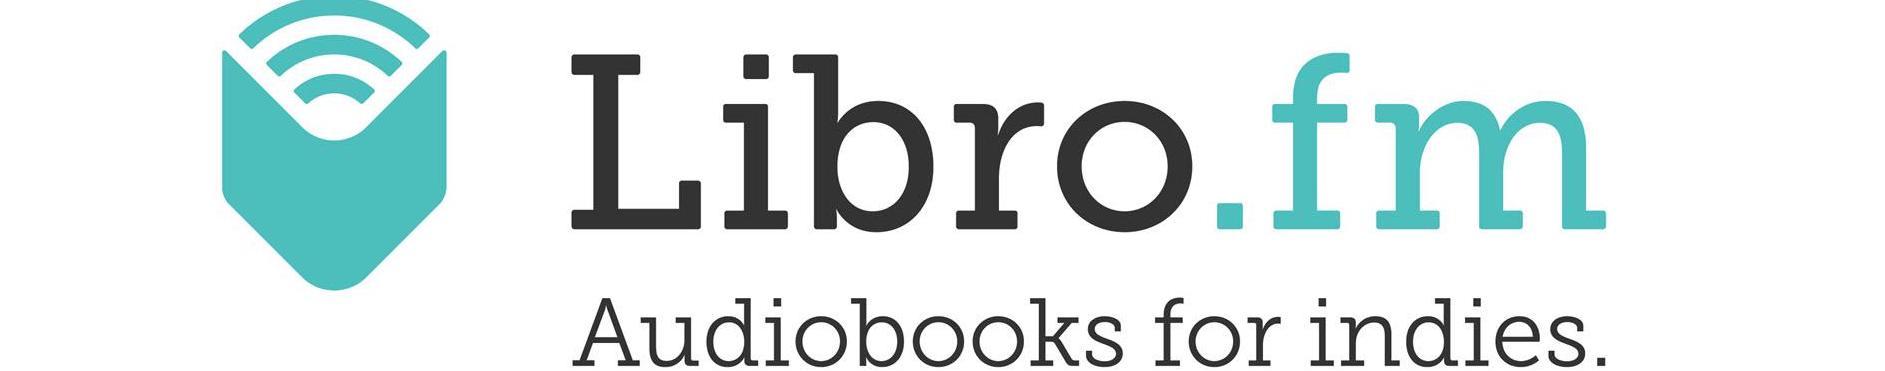 Order audiobooks through our partner libro.fm